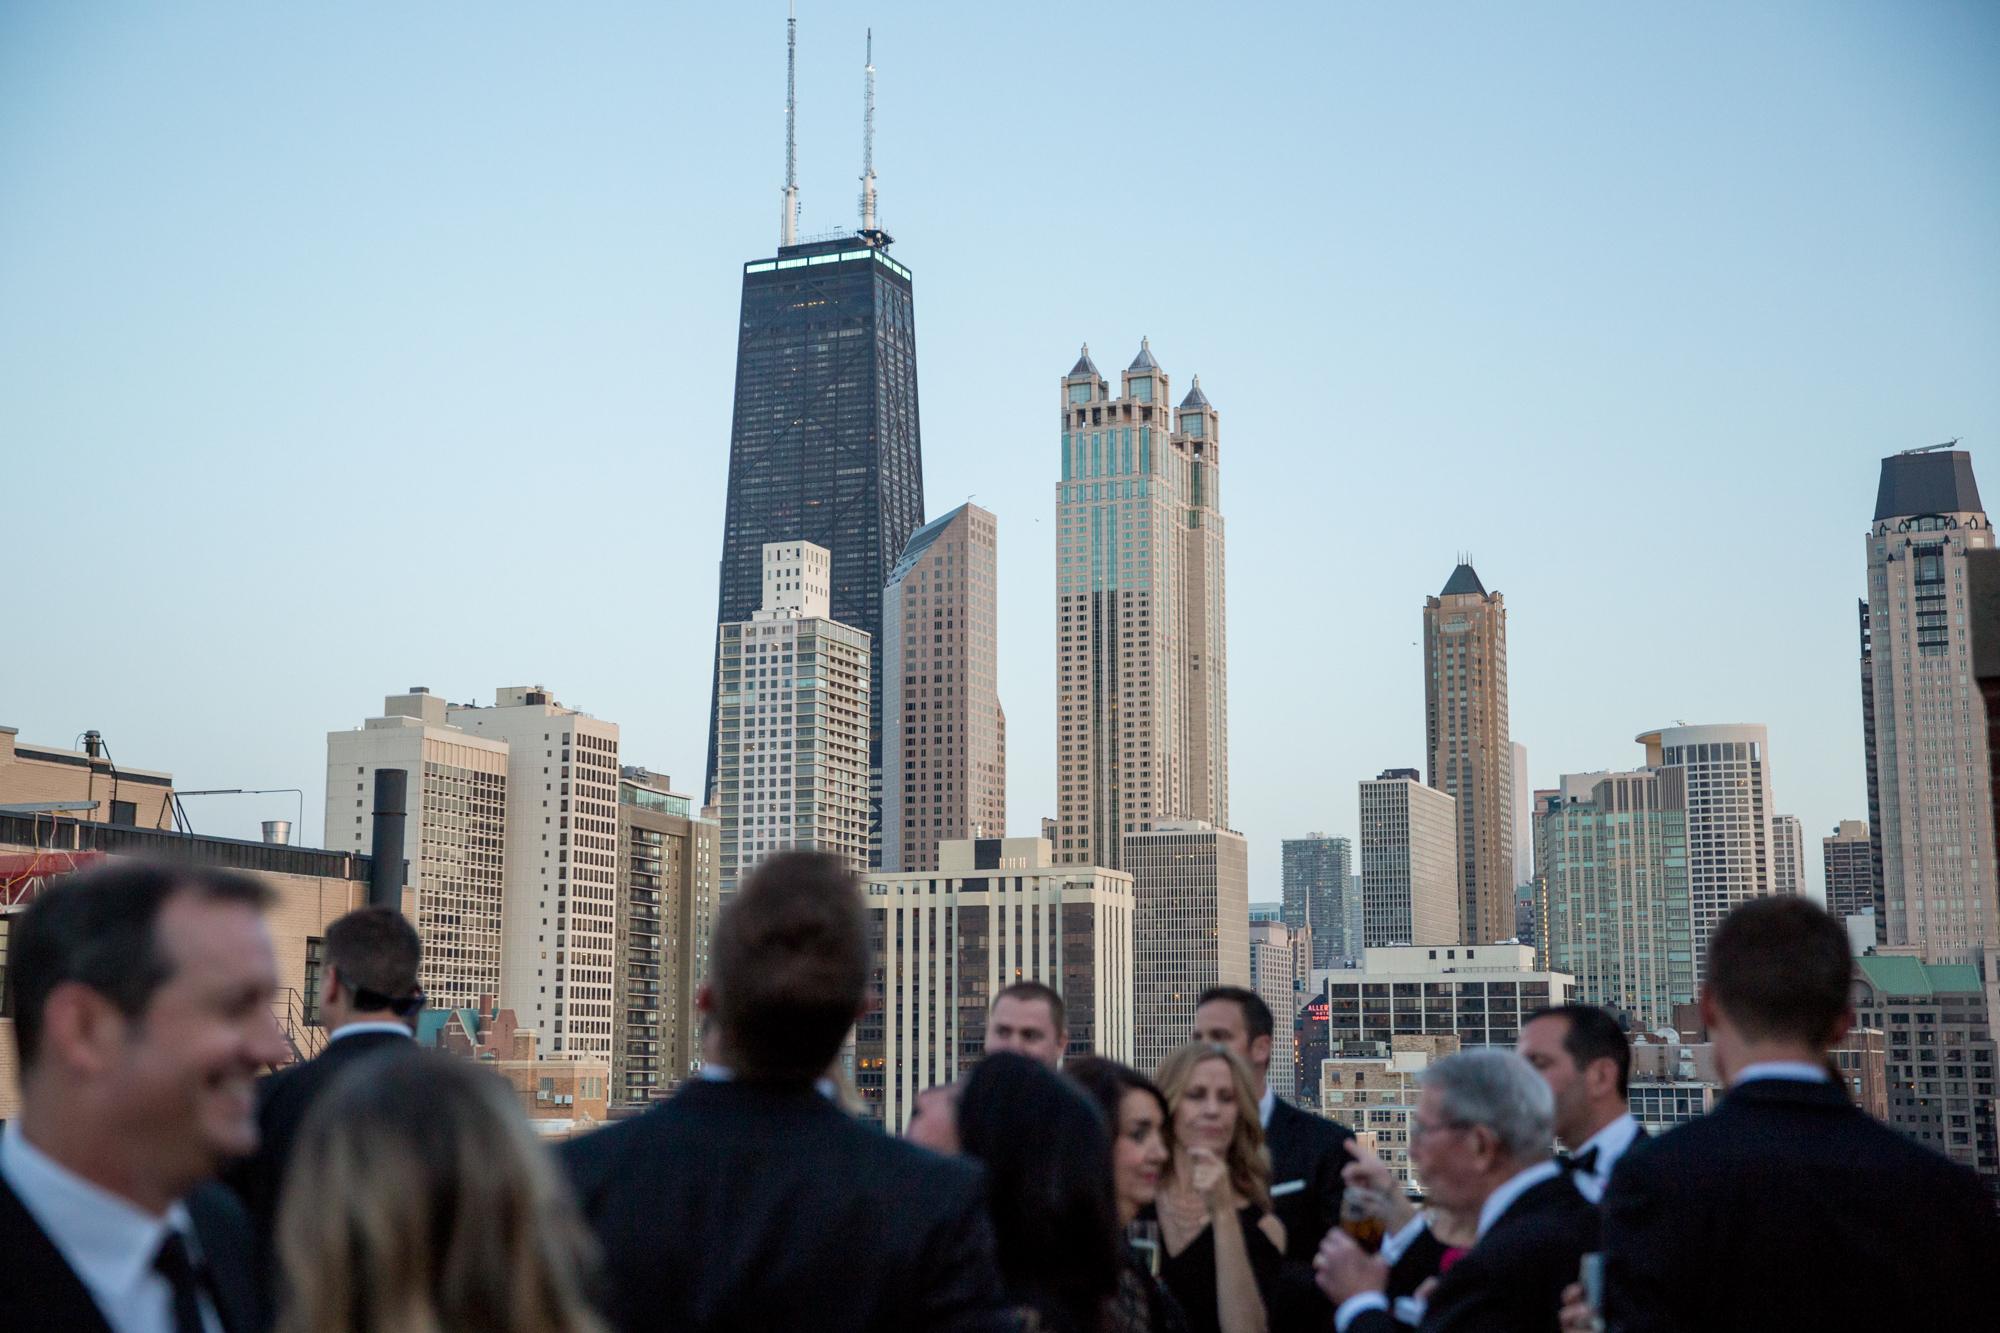 The Public Chicago wedding